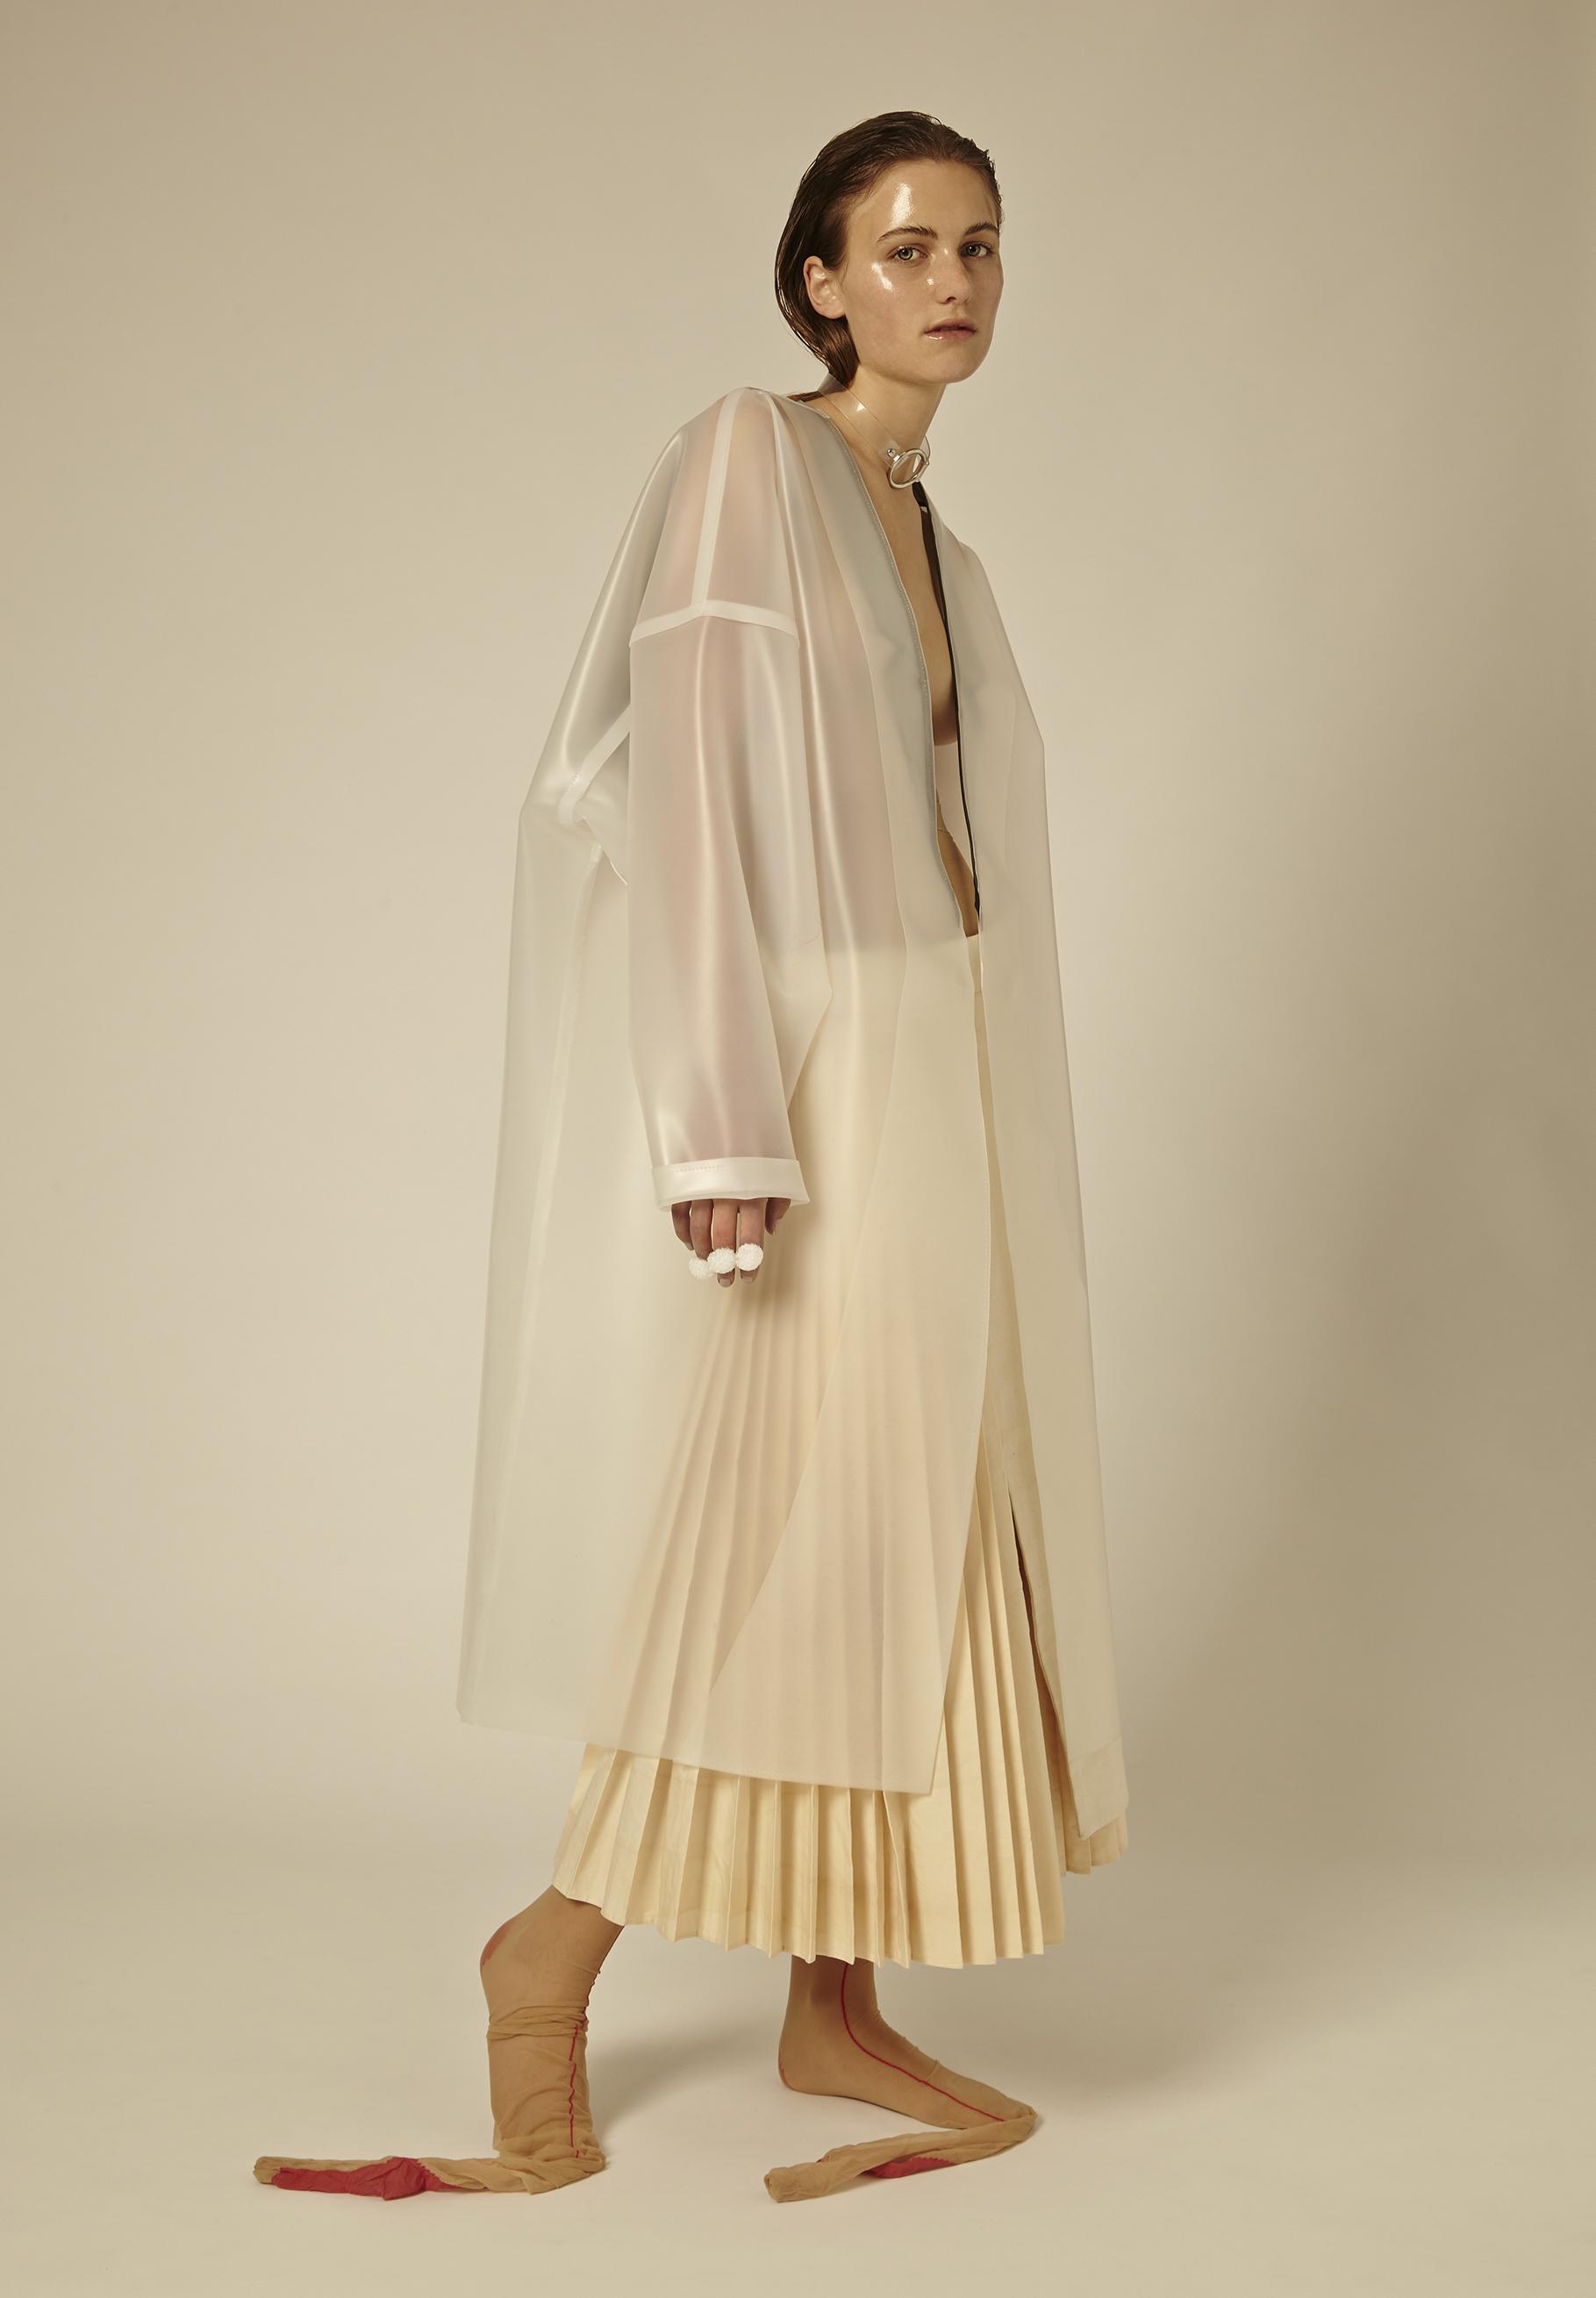 Latex coat by Xun Li, BFA Menswear Design. Skirt by Ruone Yan, BFA Menswear Design. Necklace, model's own. Stockings, stylist's own.